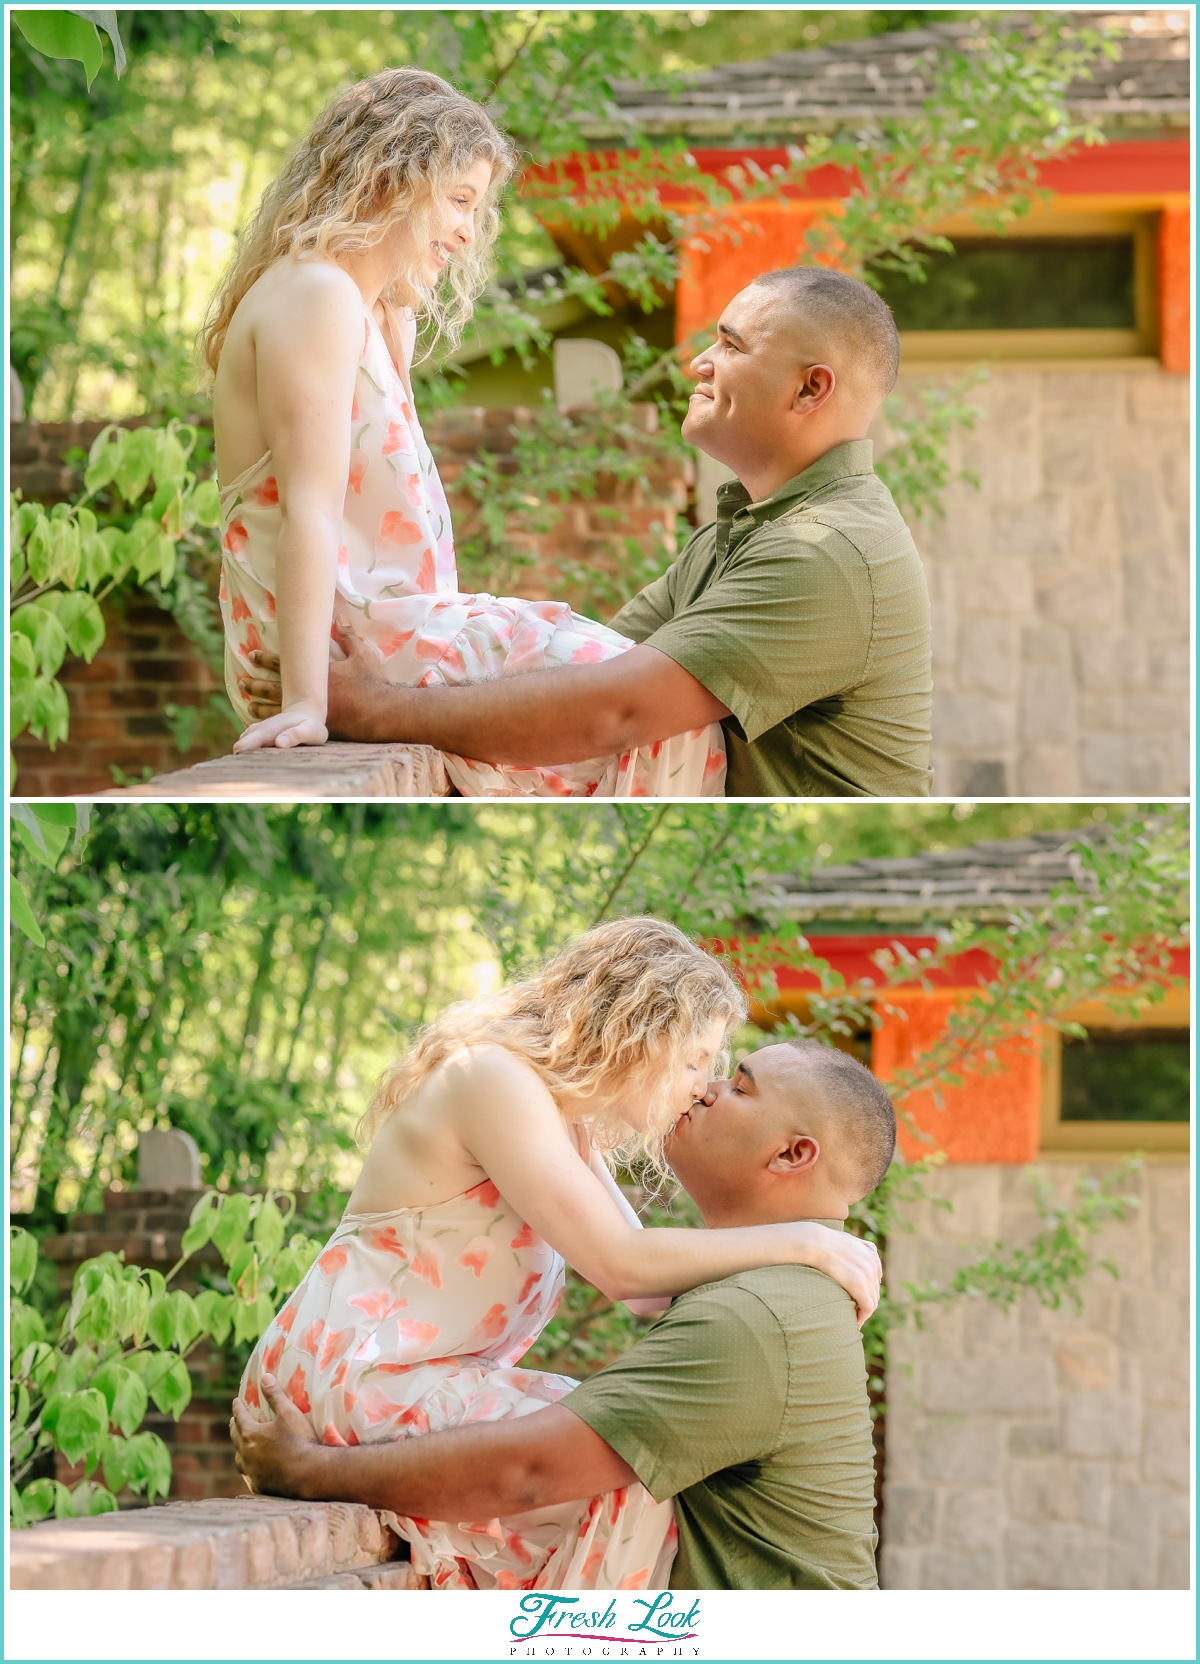 Engagement photos at Virginia Zoo